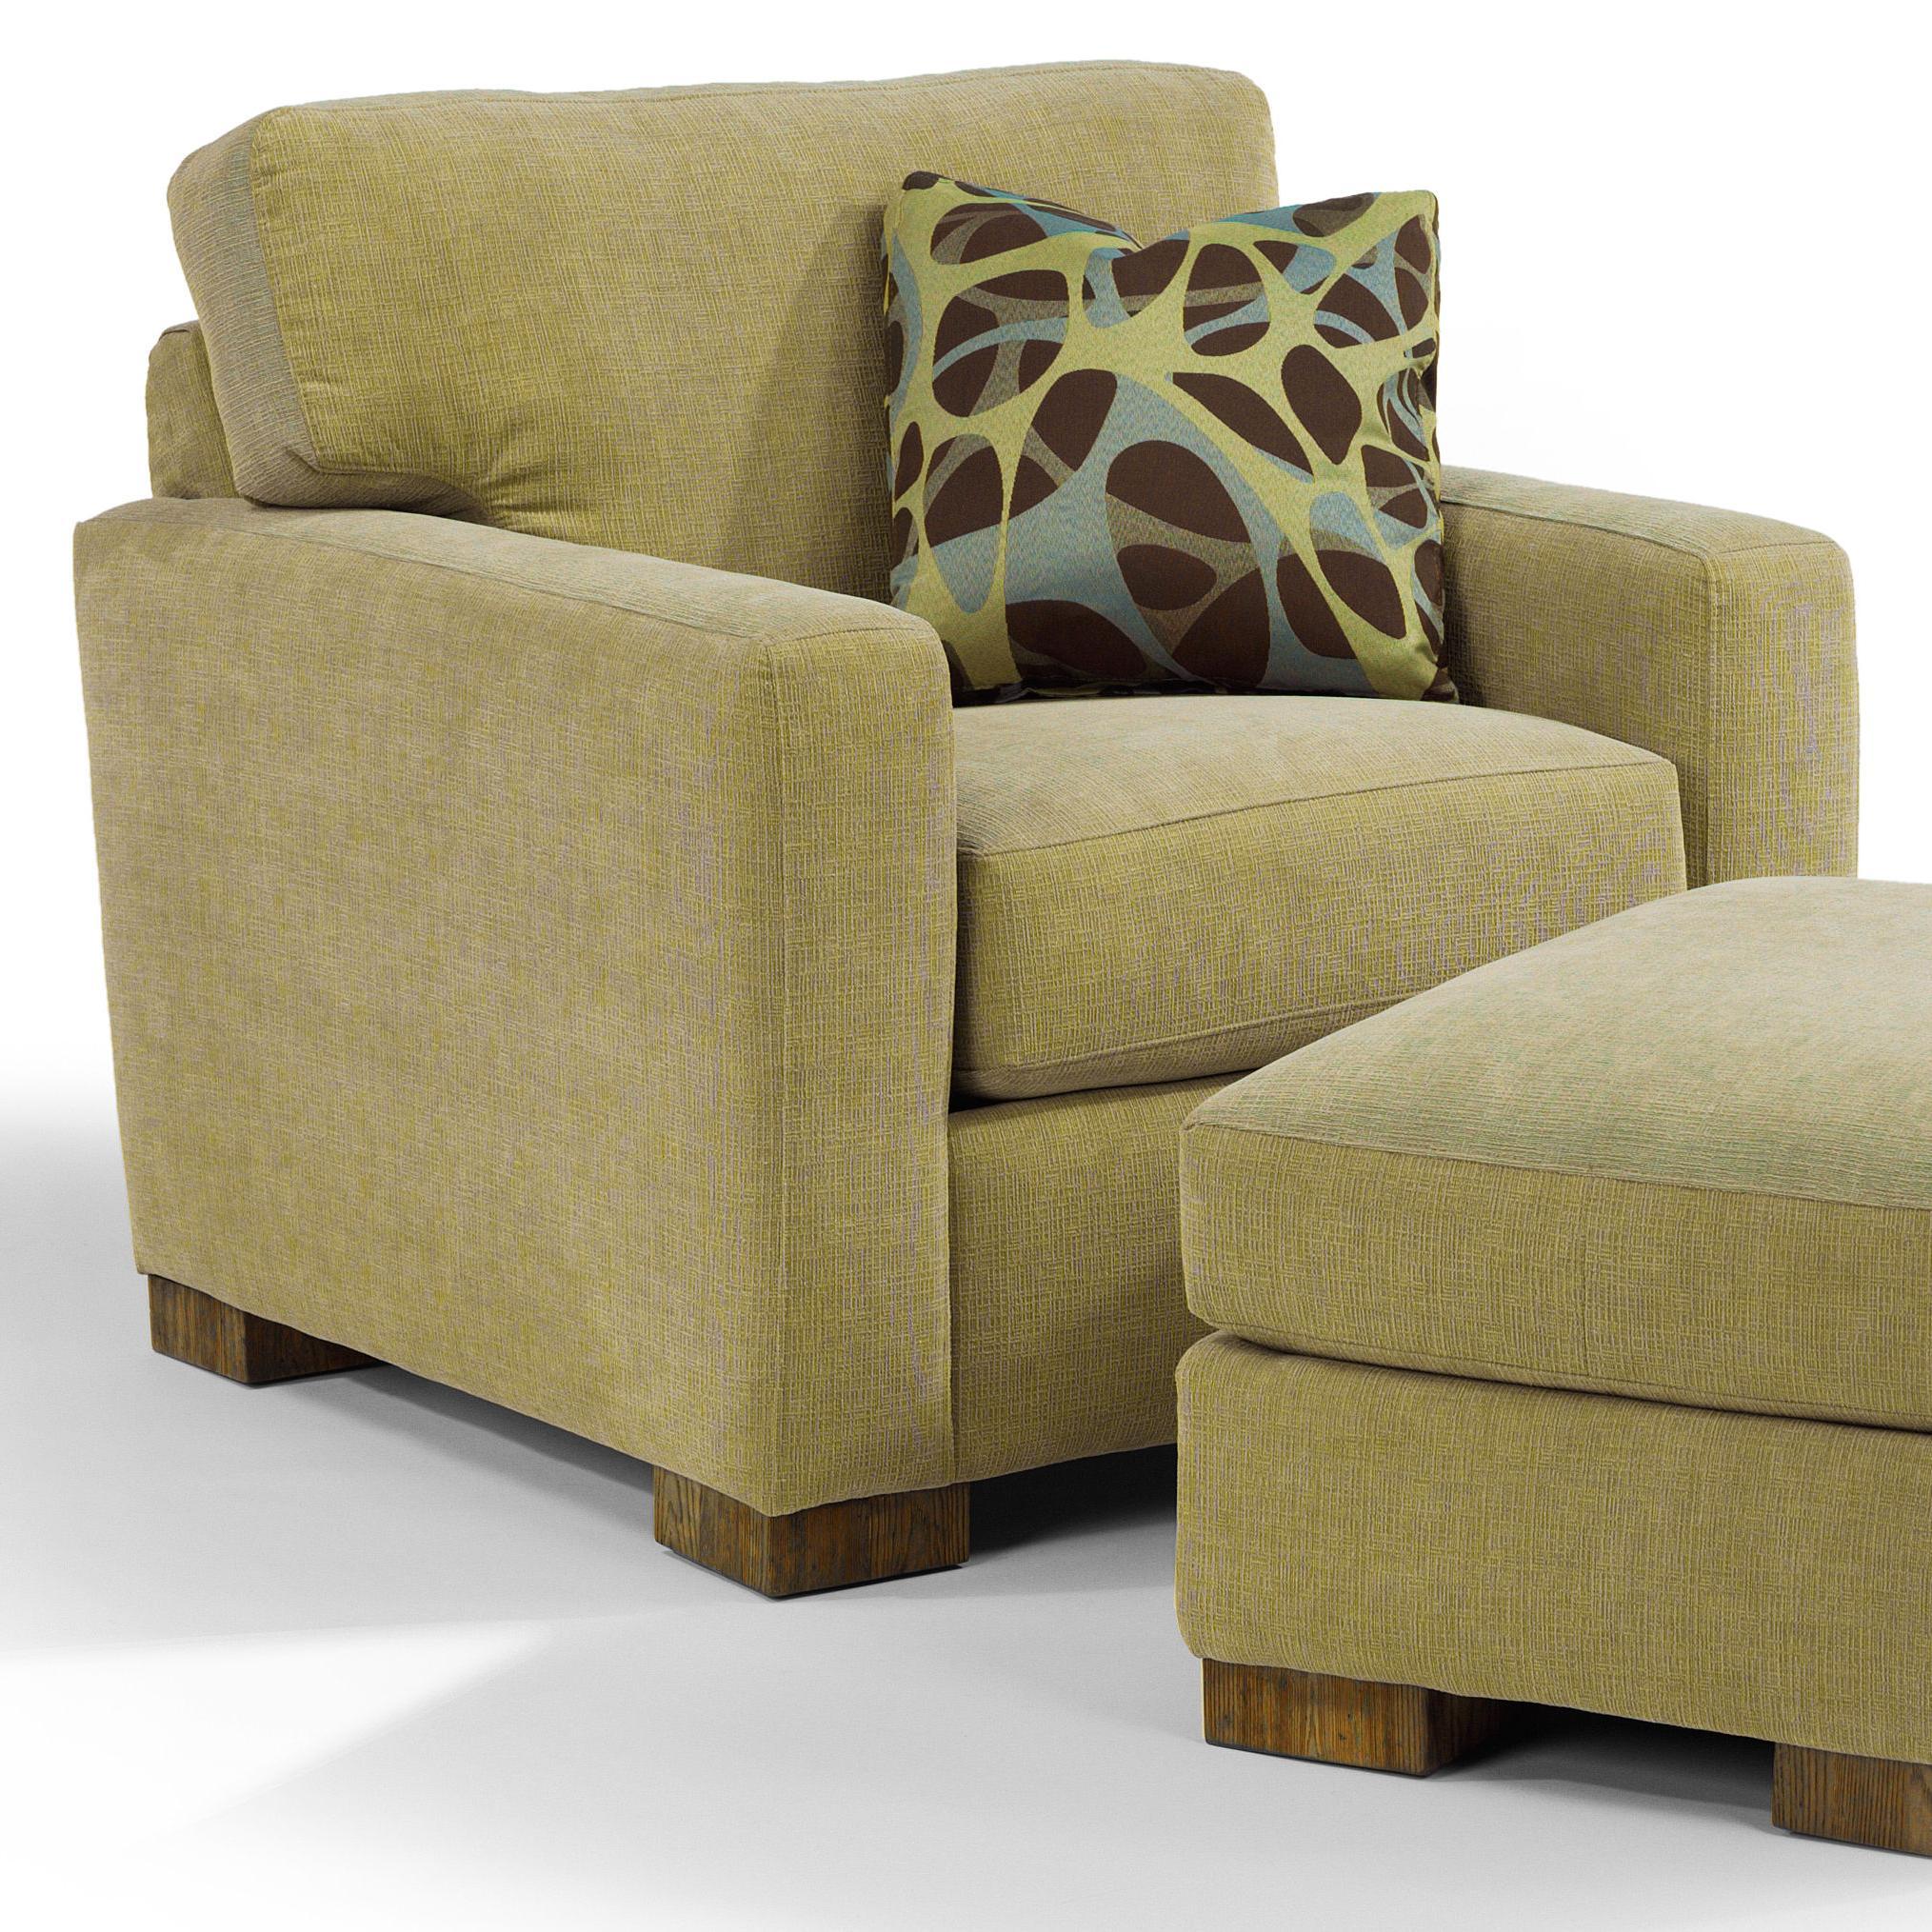 Flexsteel Bryant Chair - Item Number: 7399-10